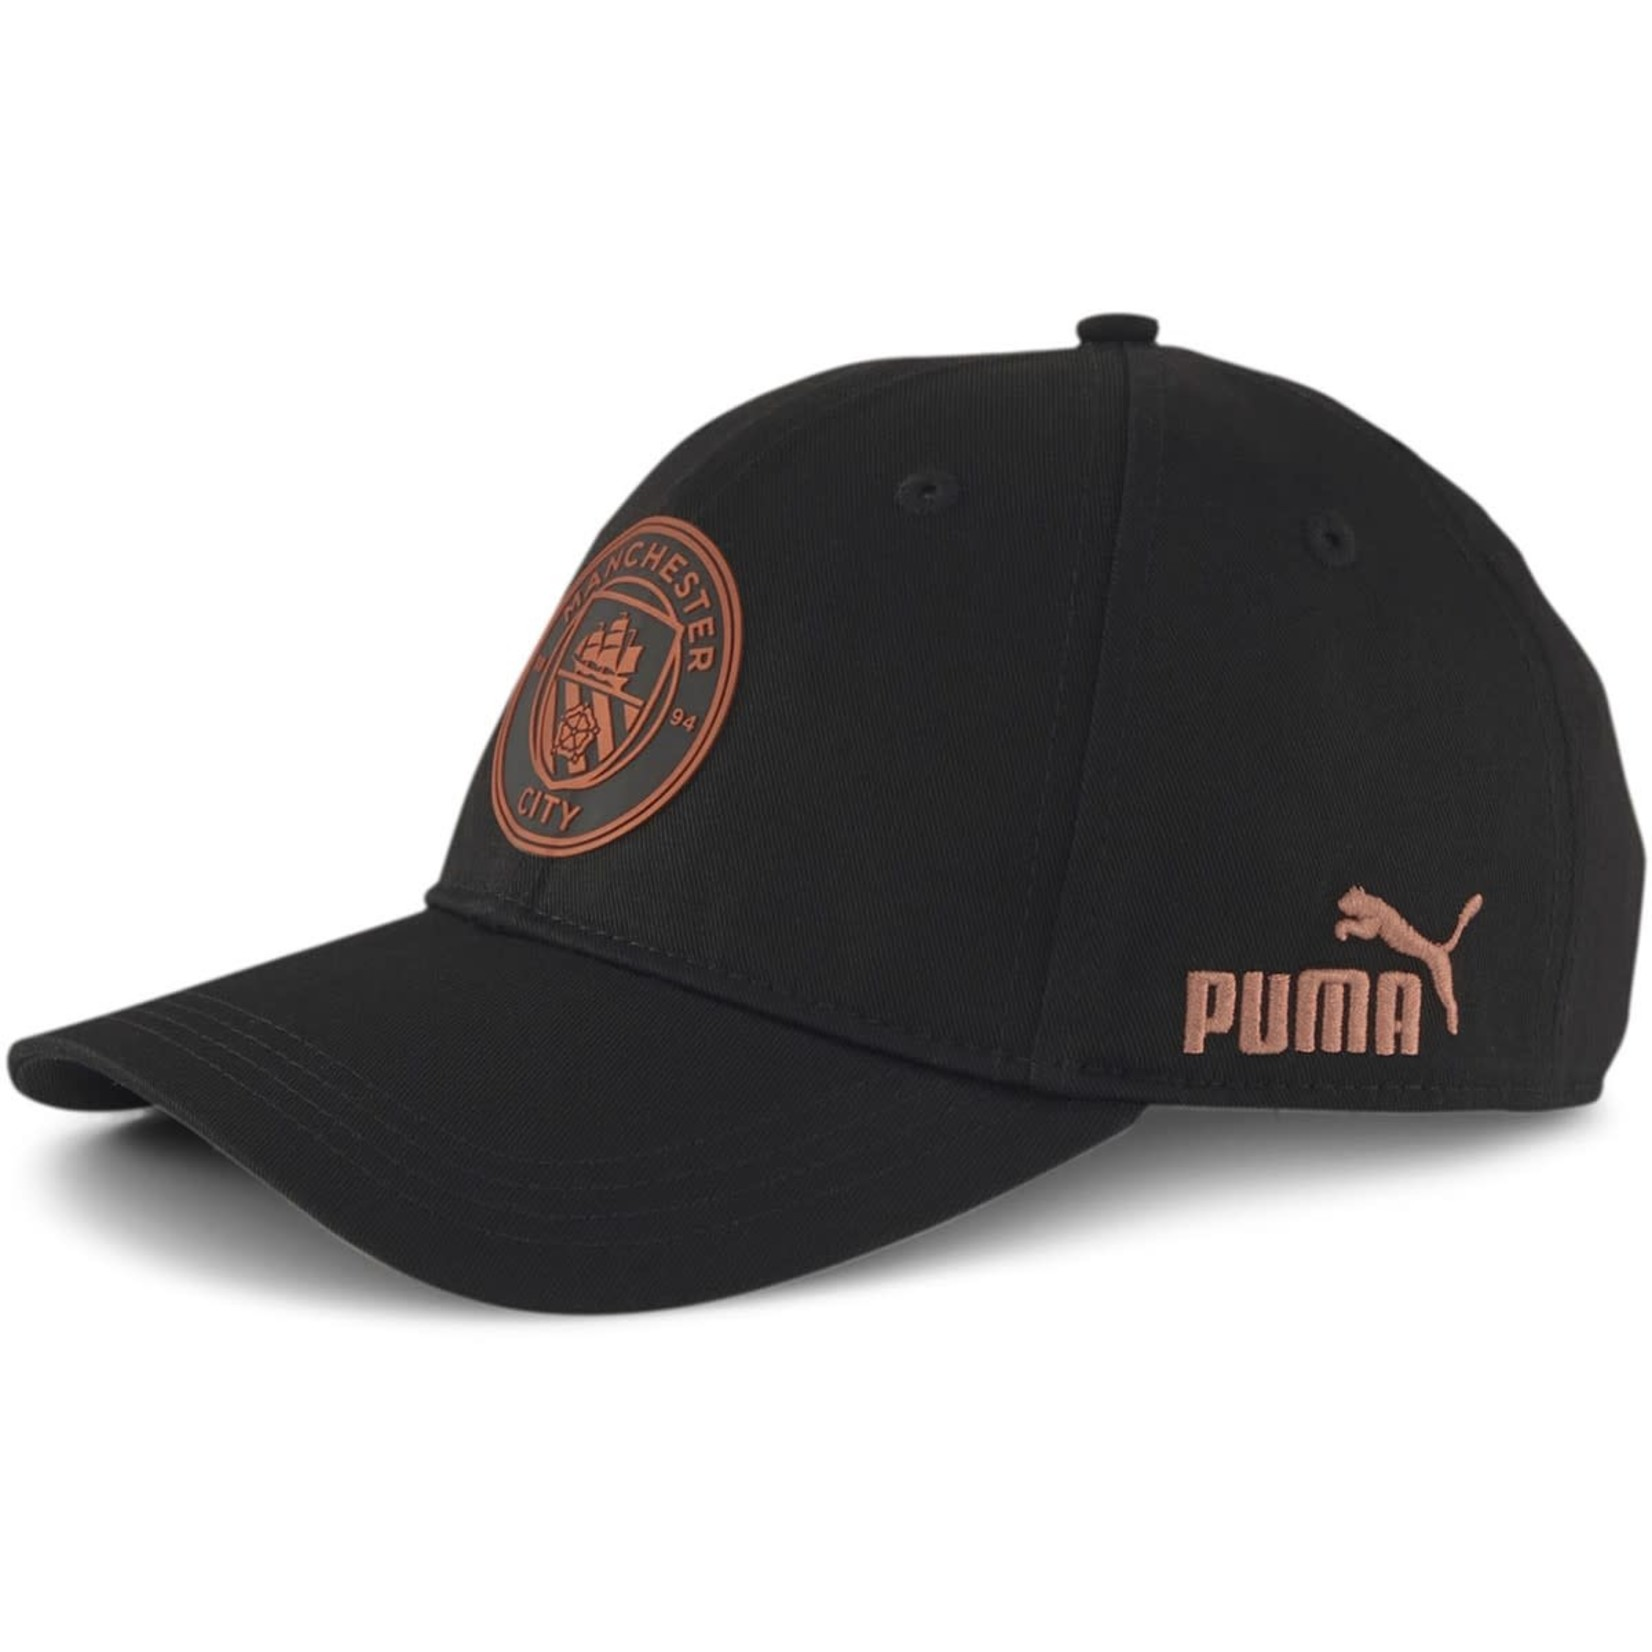 PUMA MANCHESTER CITY 20/21 ftblCULTURE CAP